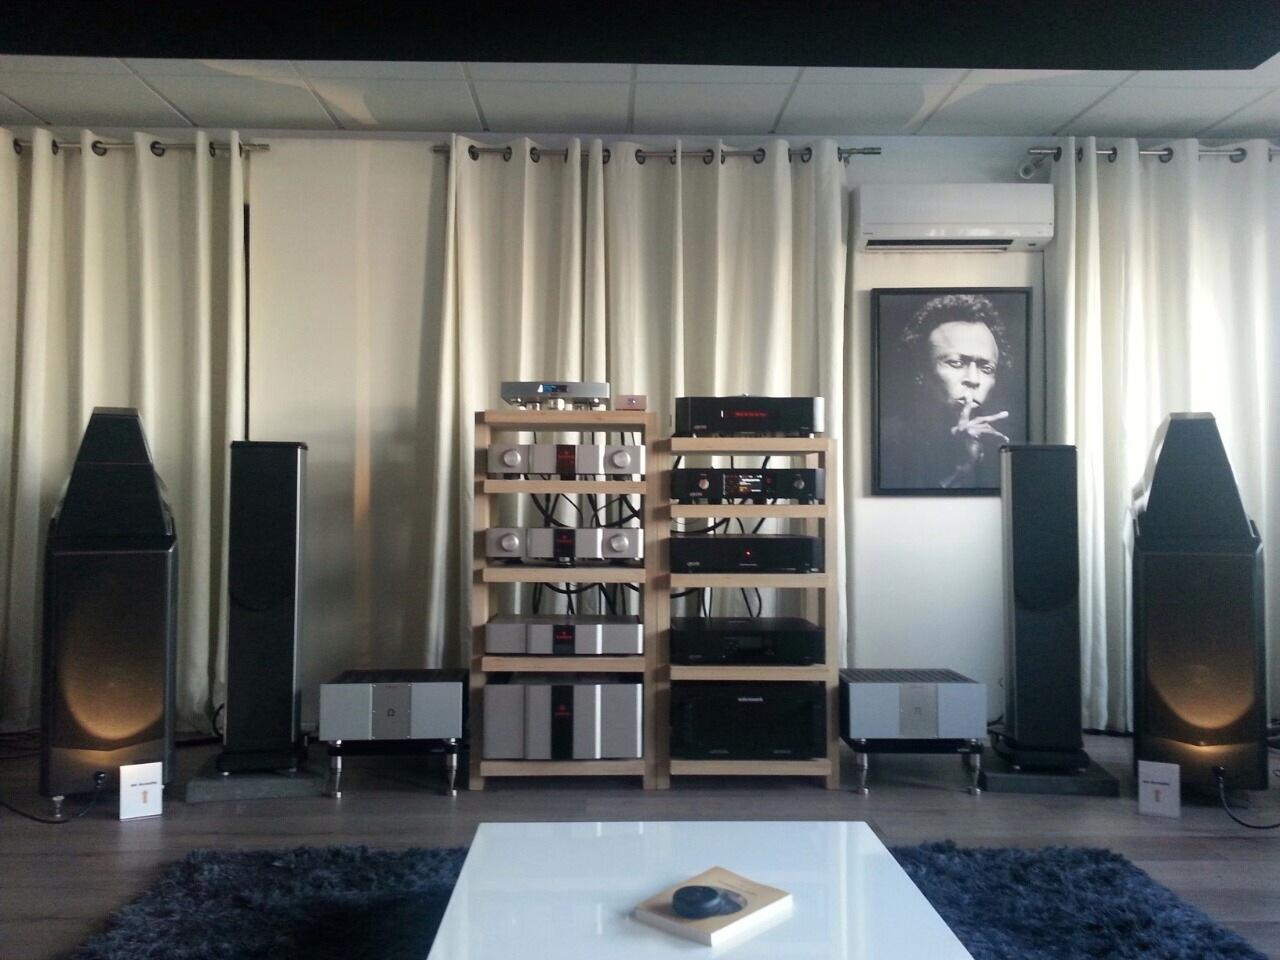 Wilson Audio Sasha2 + KA S 600 + KA L RefMk3 Show 2014 Lyon-1